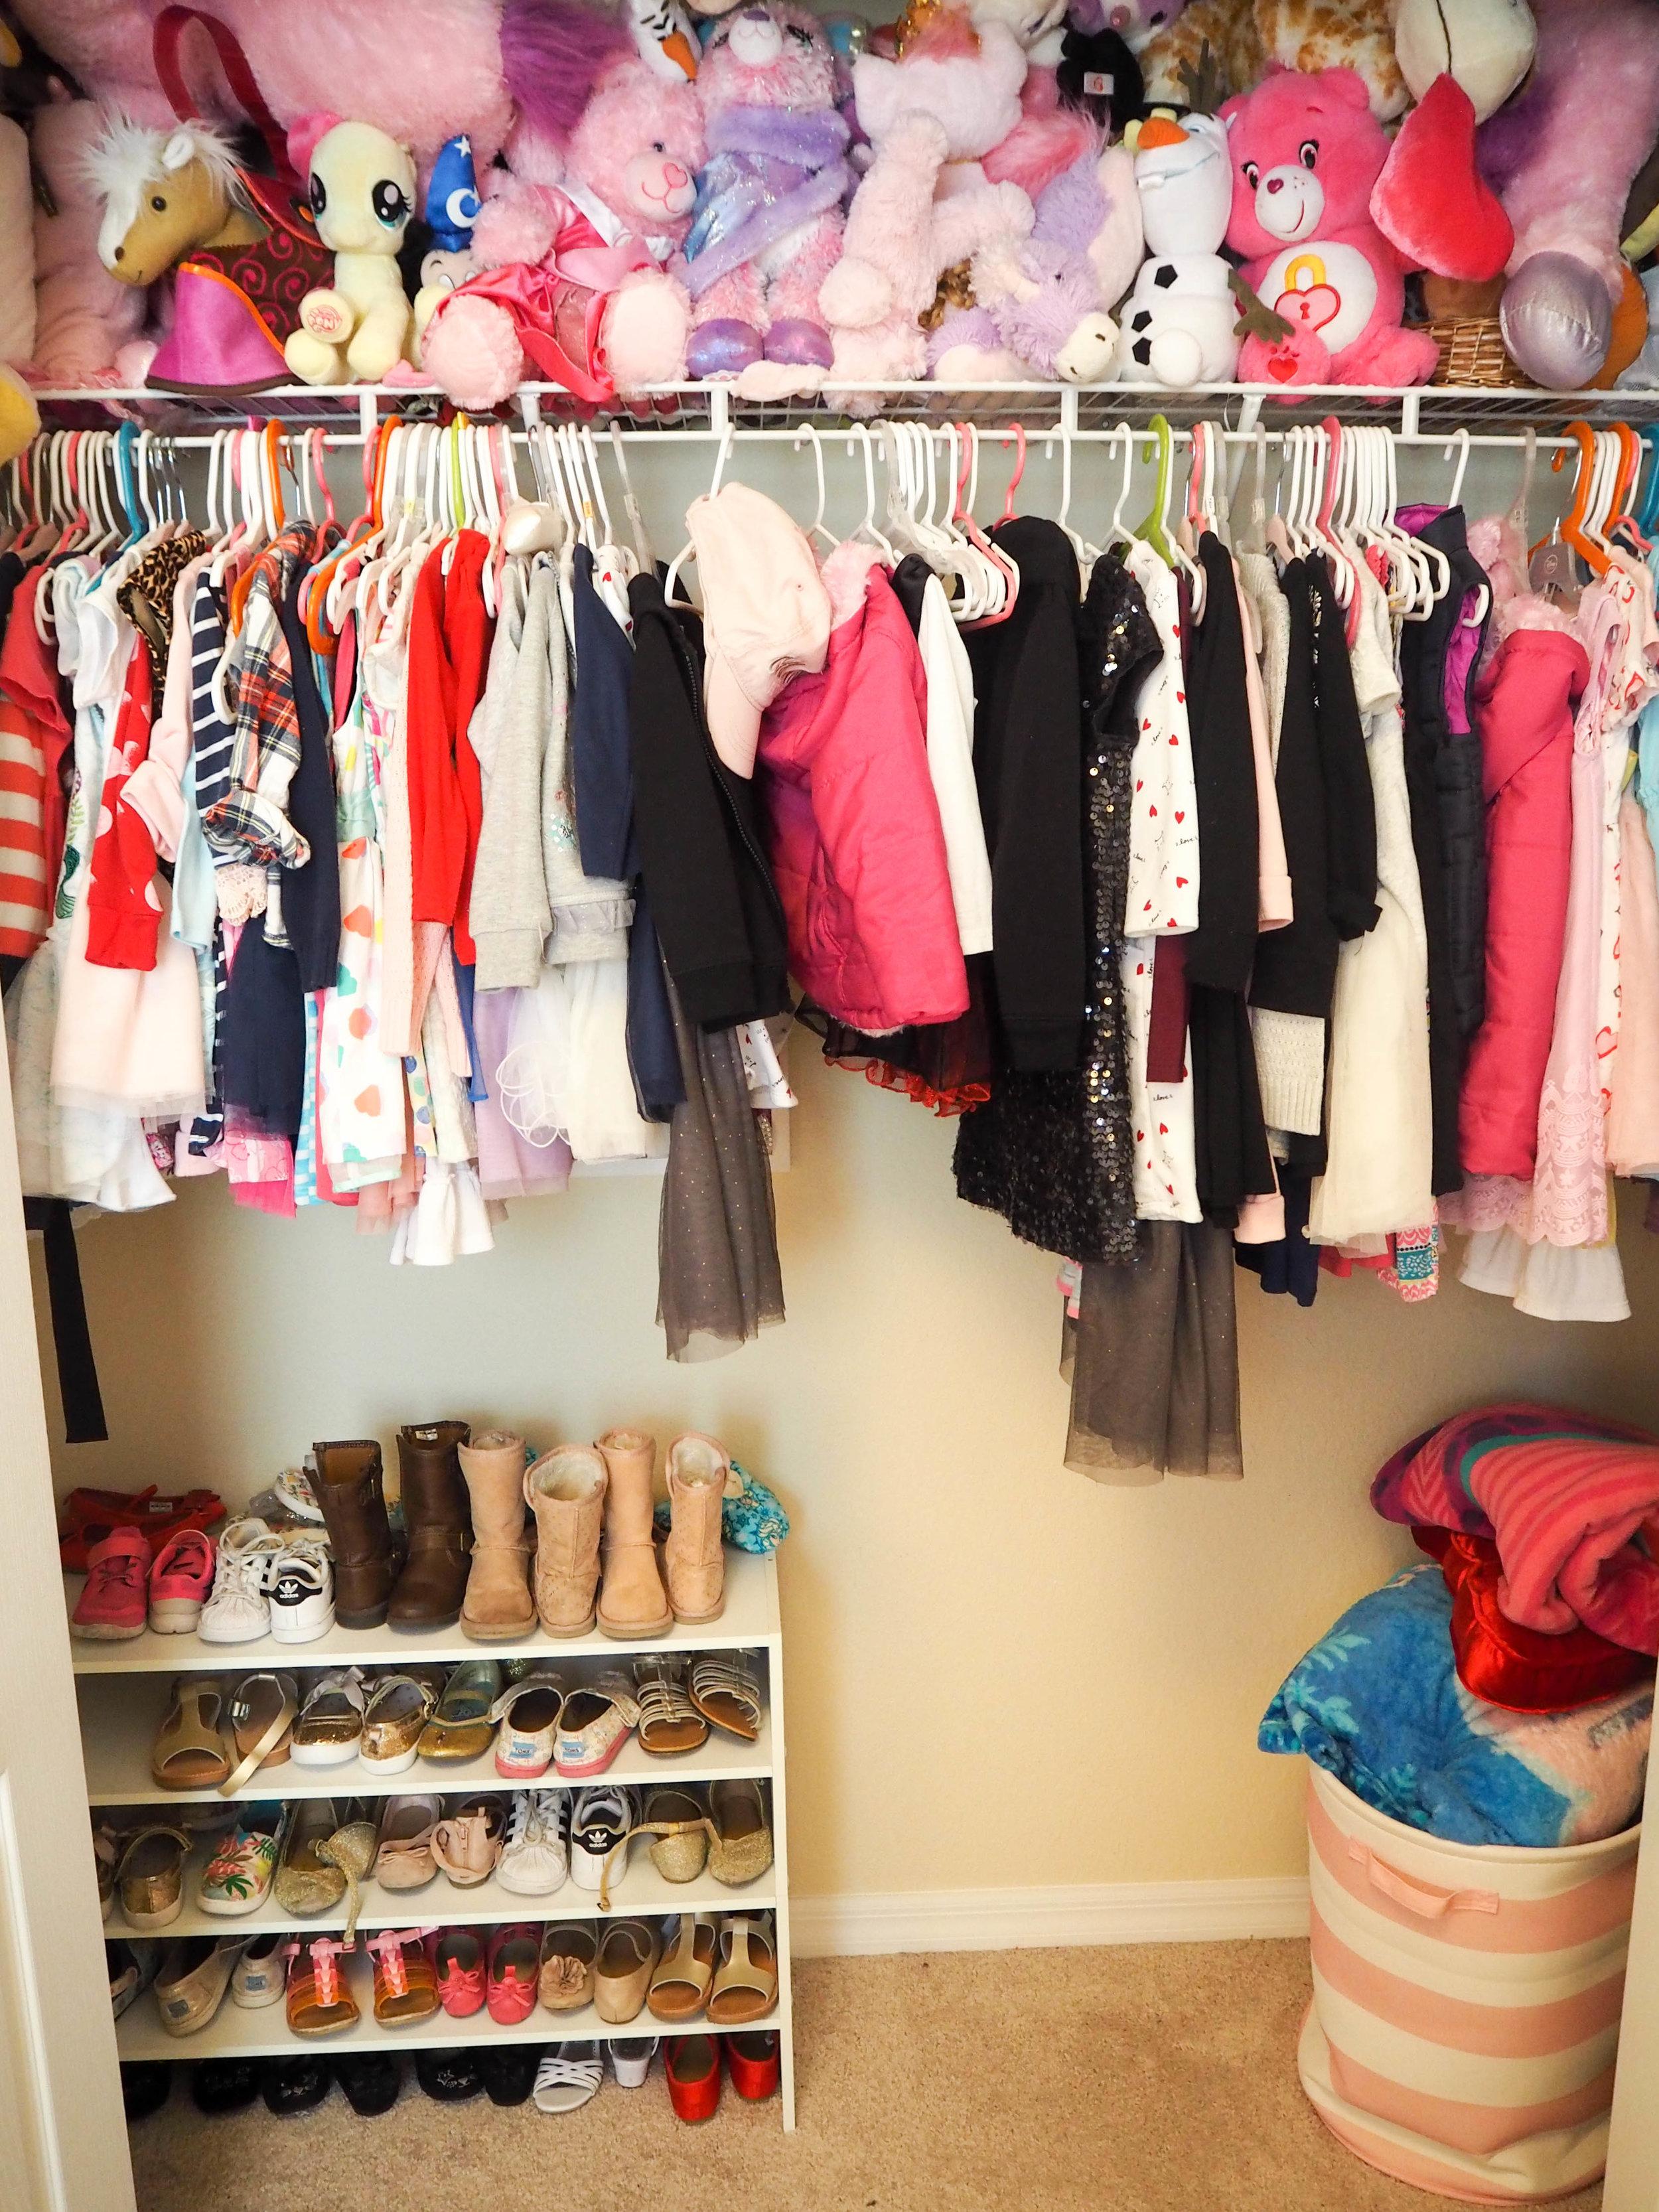 Shoe shelves stacked ,  bin